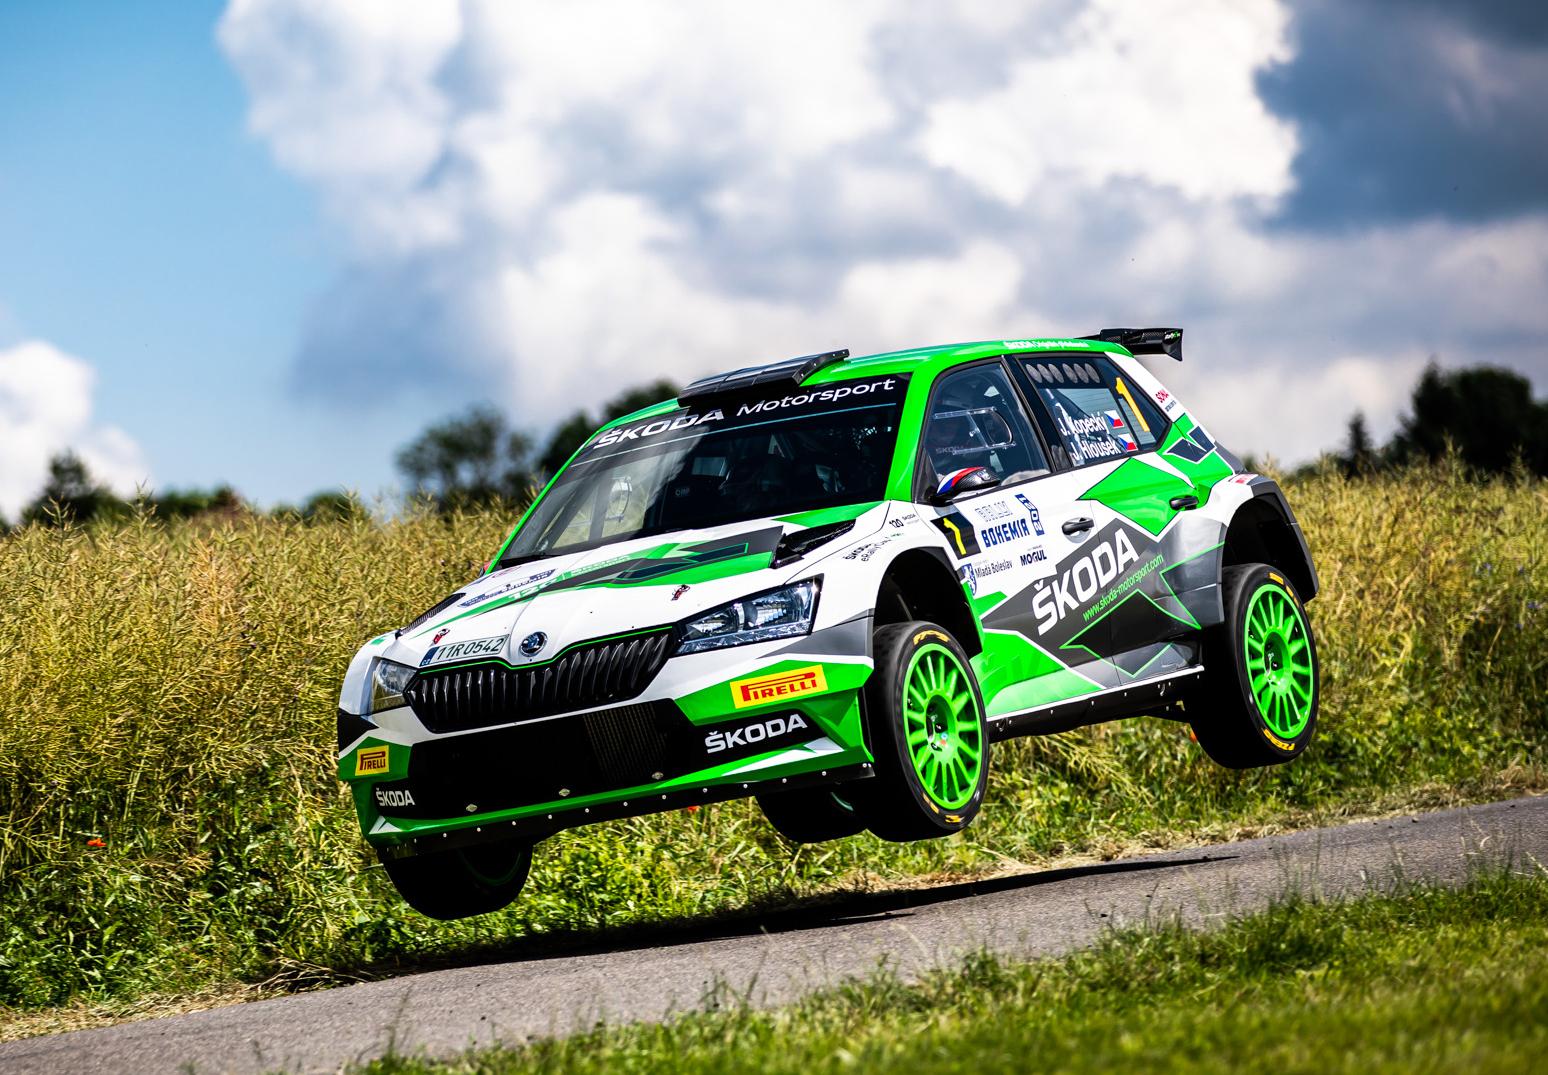 Jan Kopecký celebrates 120 years of SKODA in motorsport with ninth victory at Bohemia Rally - Image 7